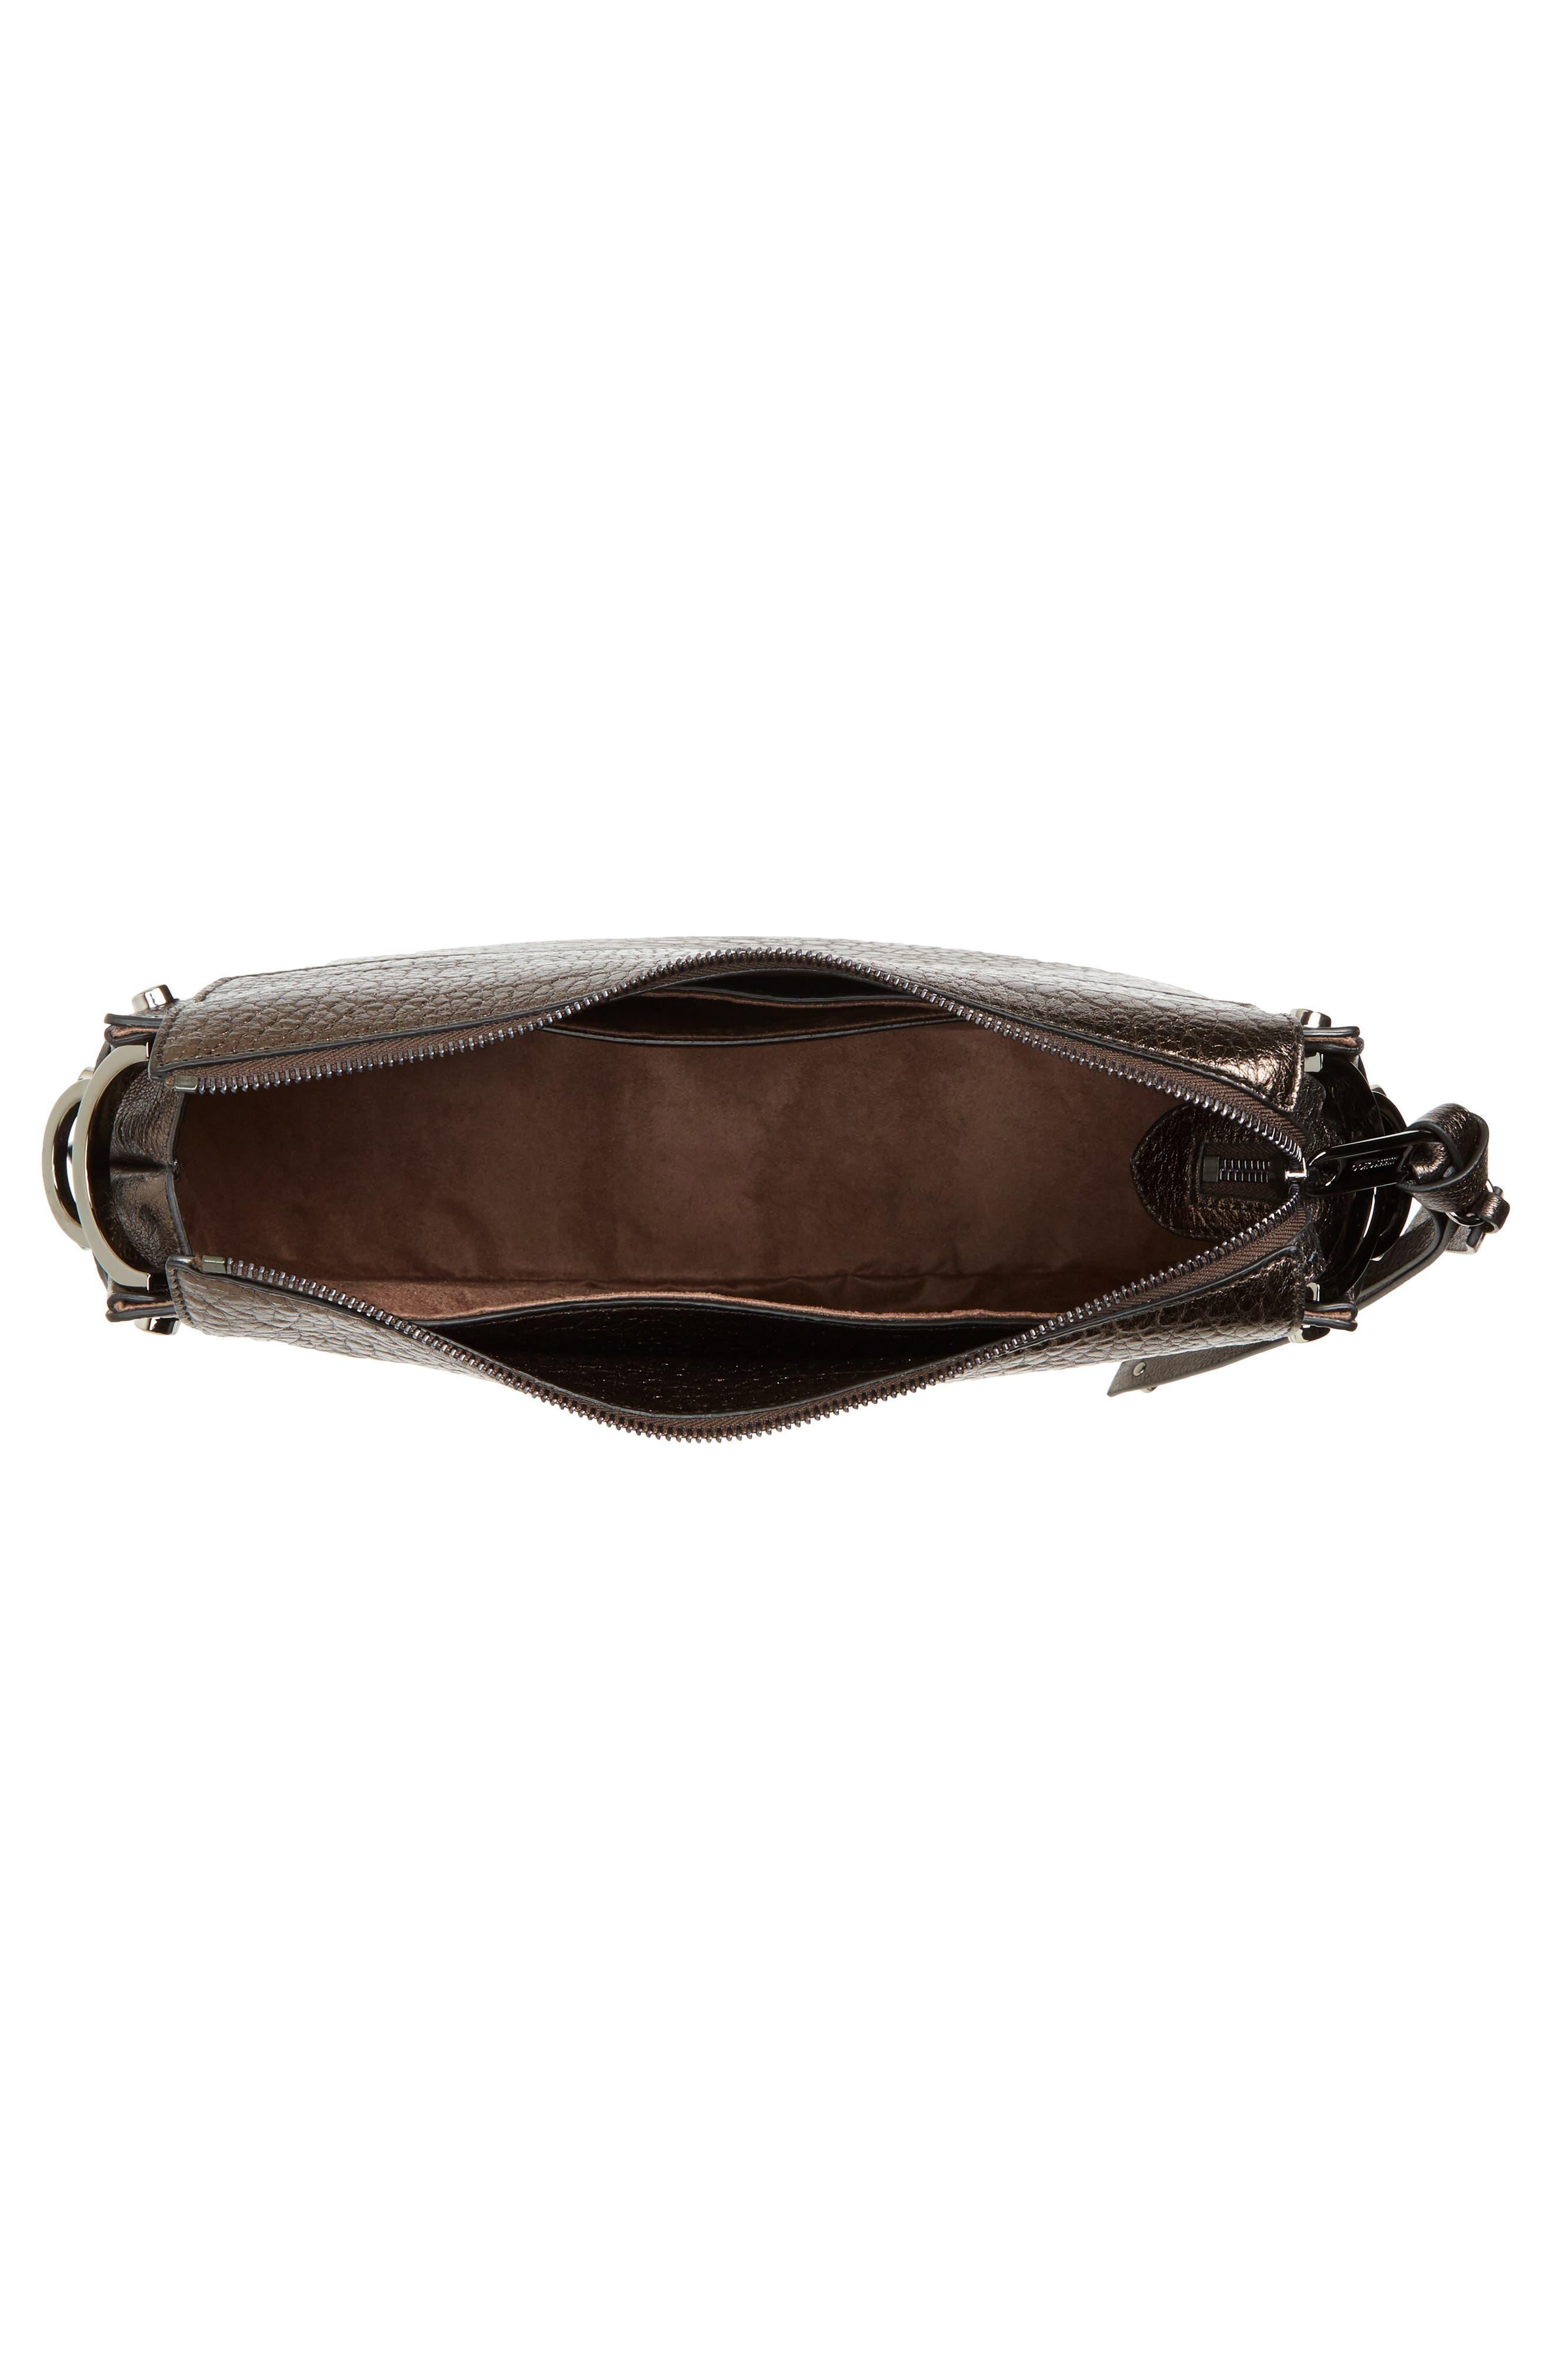 Artie Metallic Leather Hobo Bag,                             Alternate thumbnail 4, color,                             200